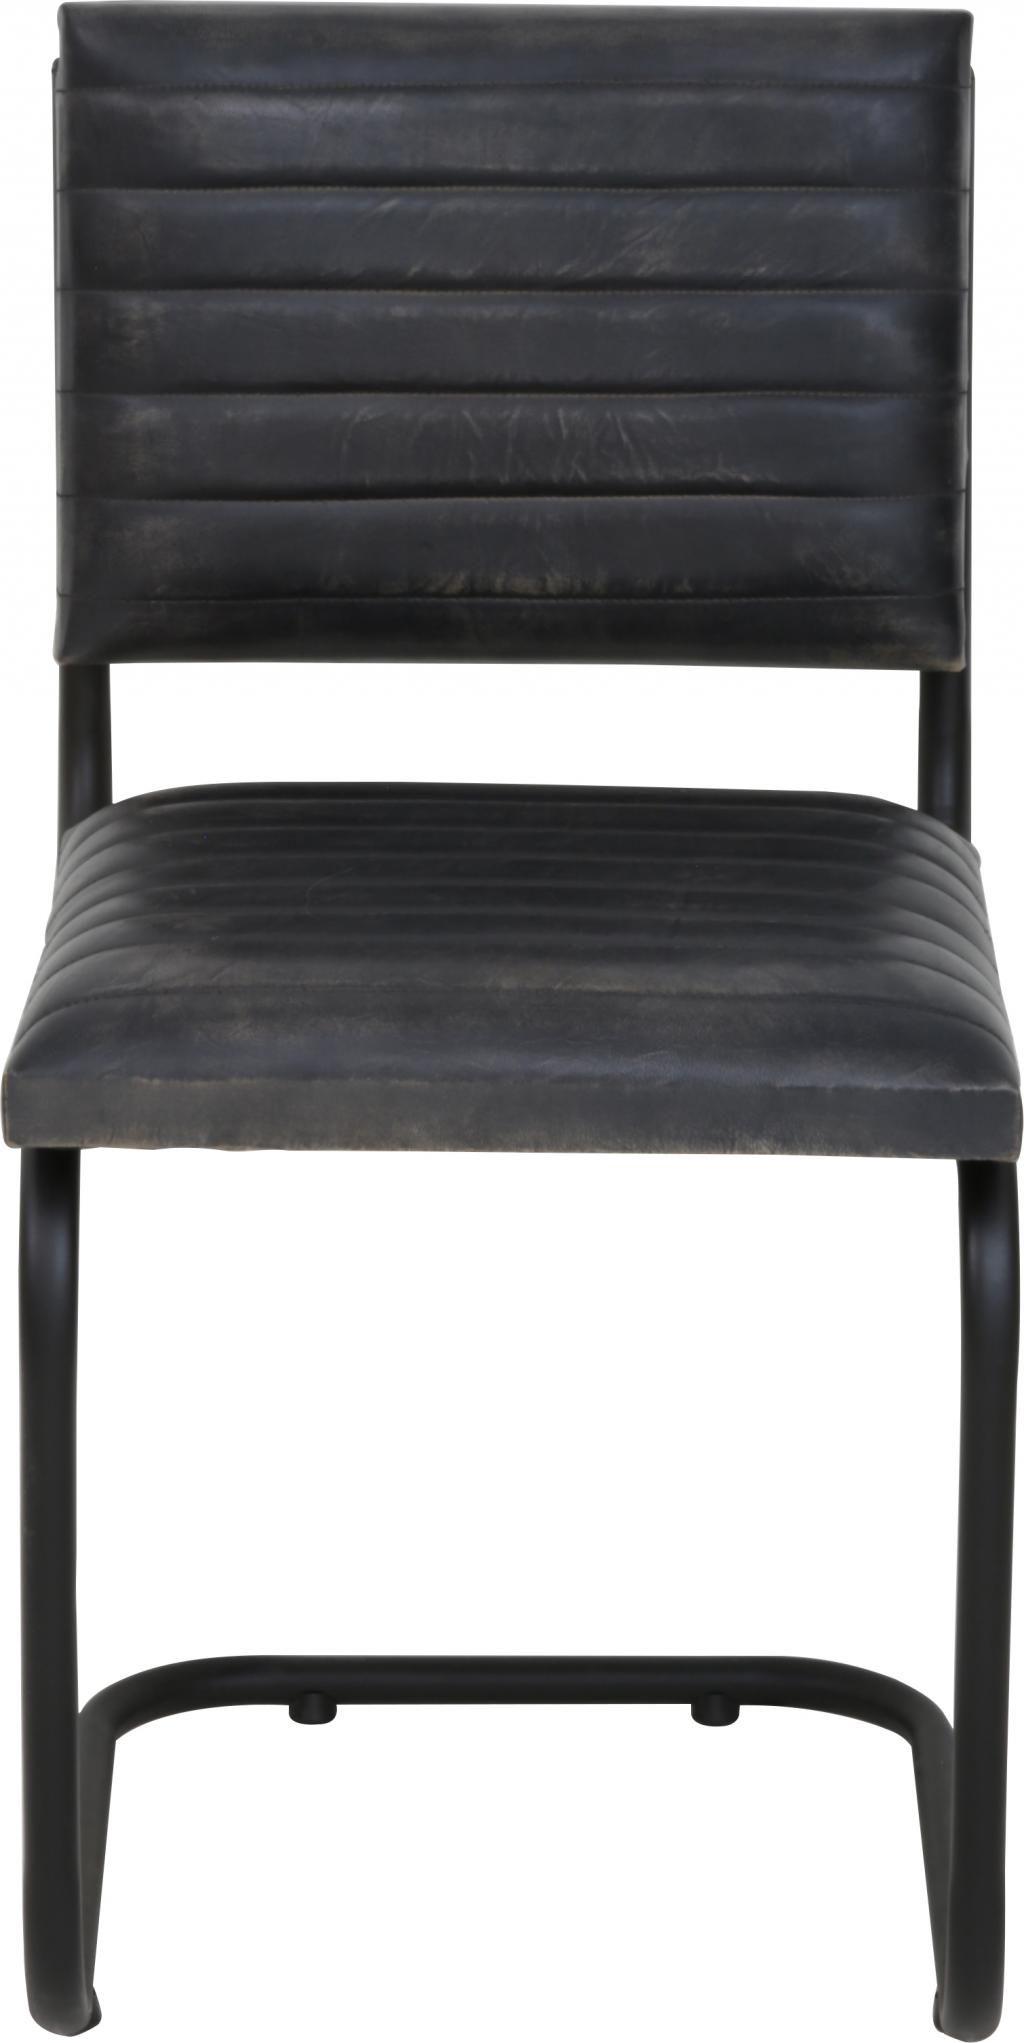 stuhl lockhart grau leder light living kaufen wohn und. Black Bedroom Furniture Sets. Home Design Ideas